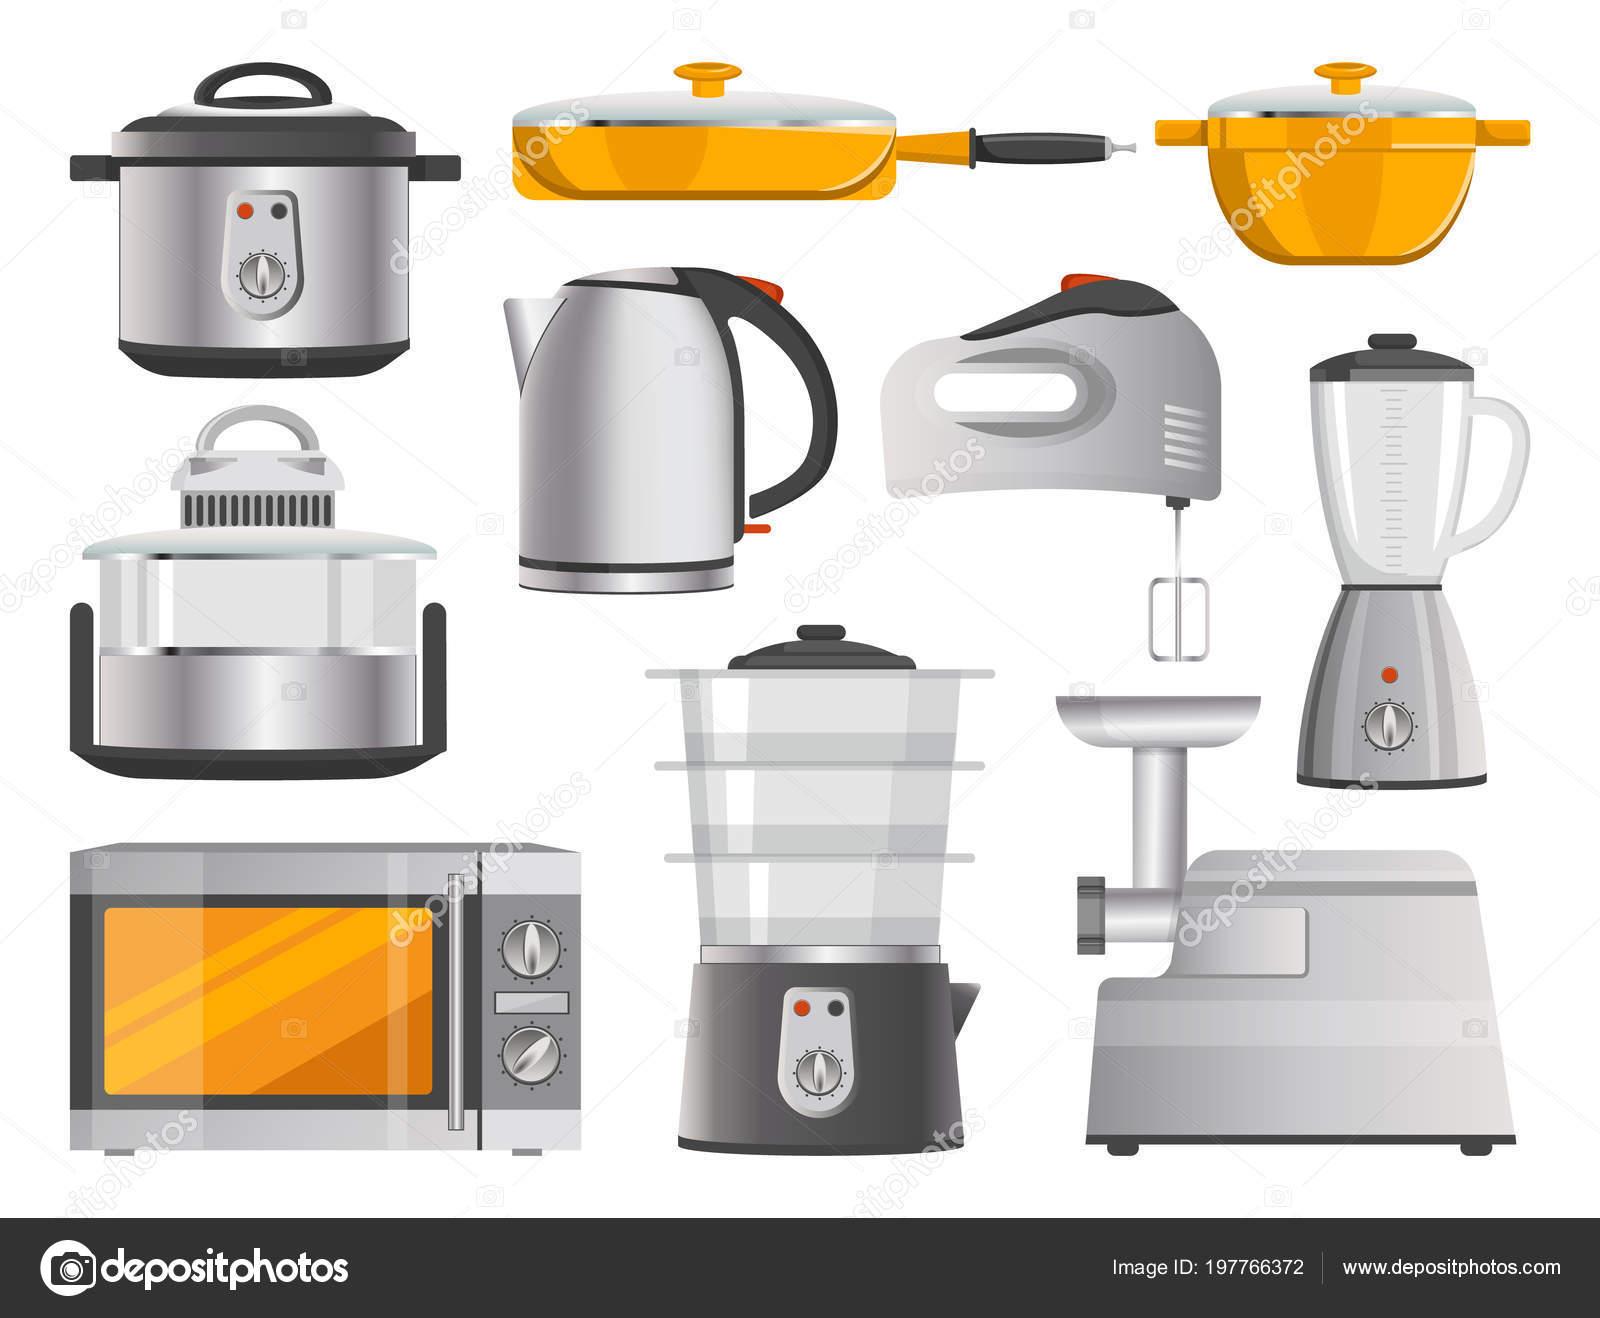 kitchen electrics commercial floor coverings 厨房电器及现代用品 图库矢量图像 c robuart 197766372 图库矢量图片